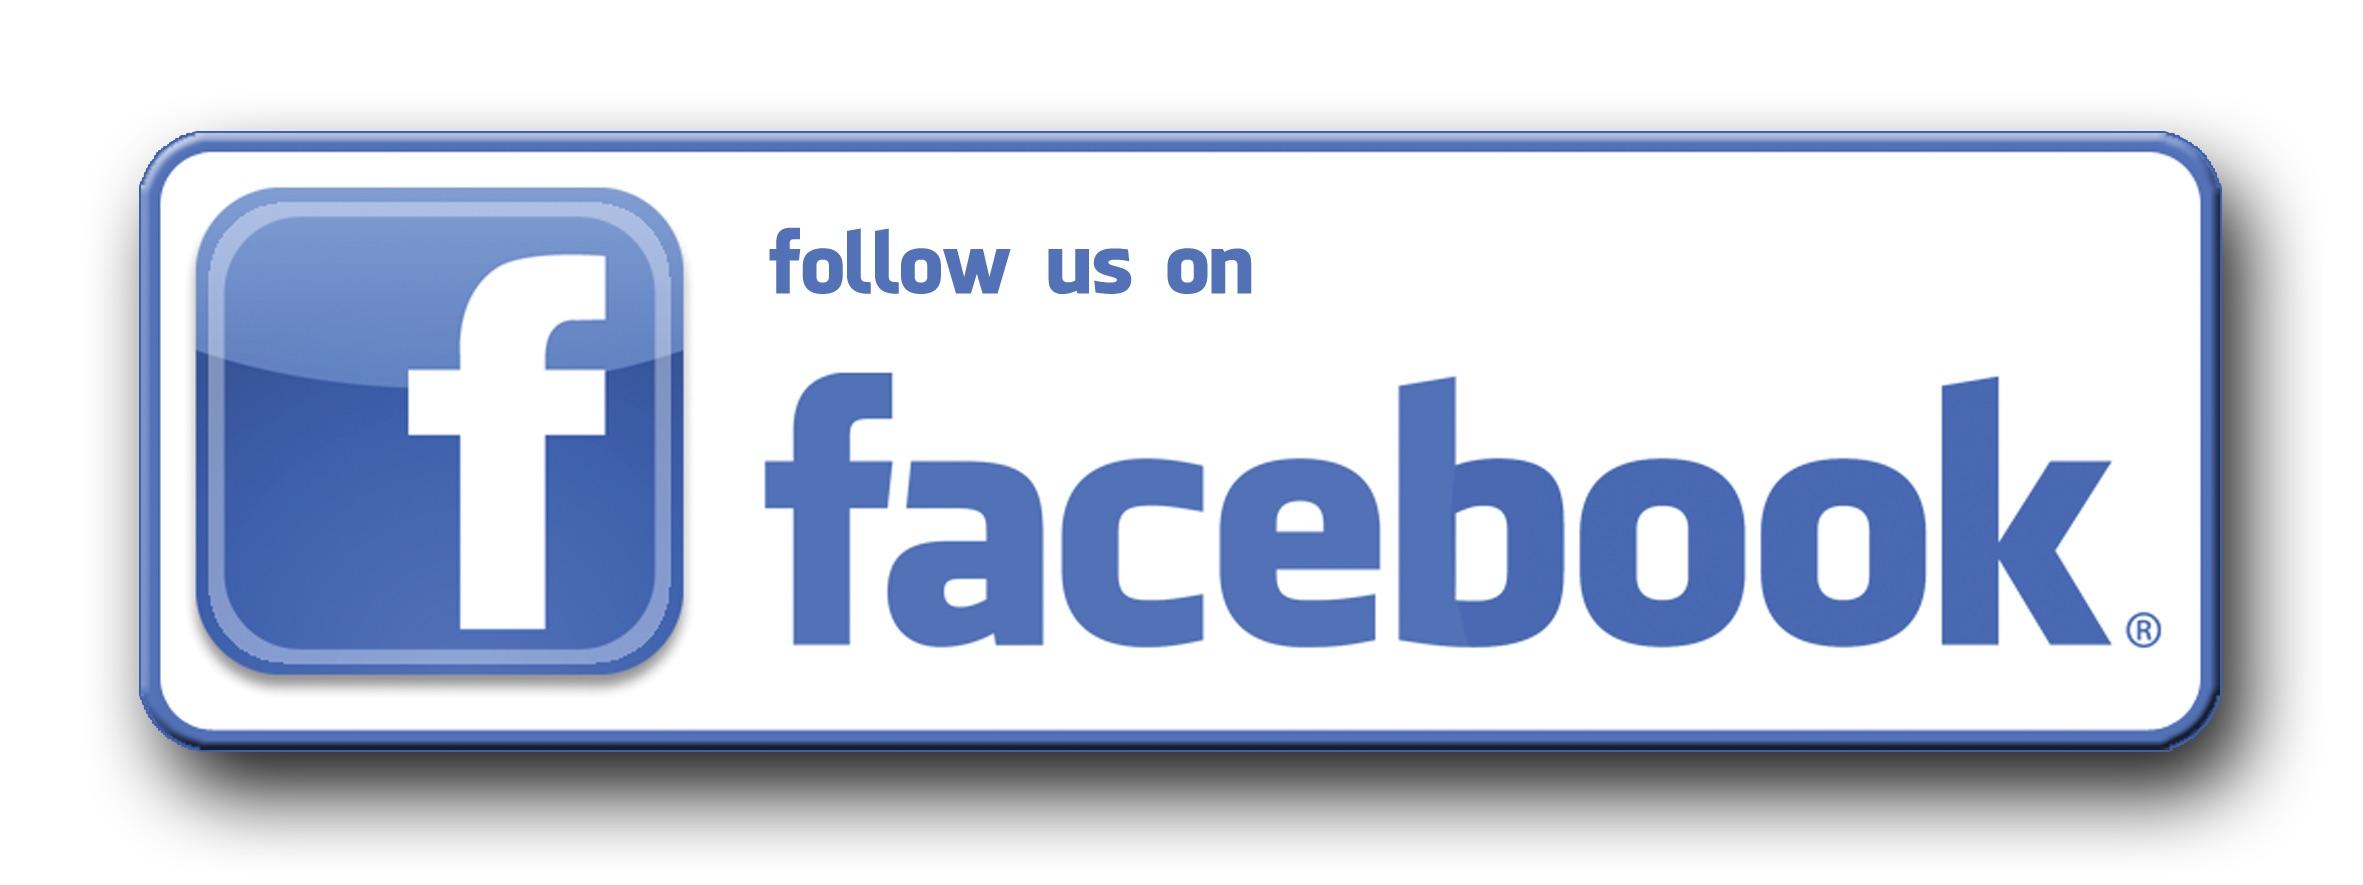 Follow-us-on-Facebook-Button-PNG-03045.jpg